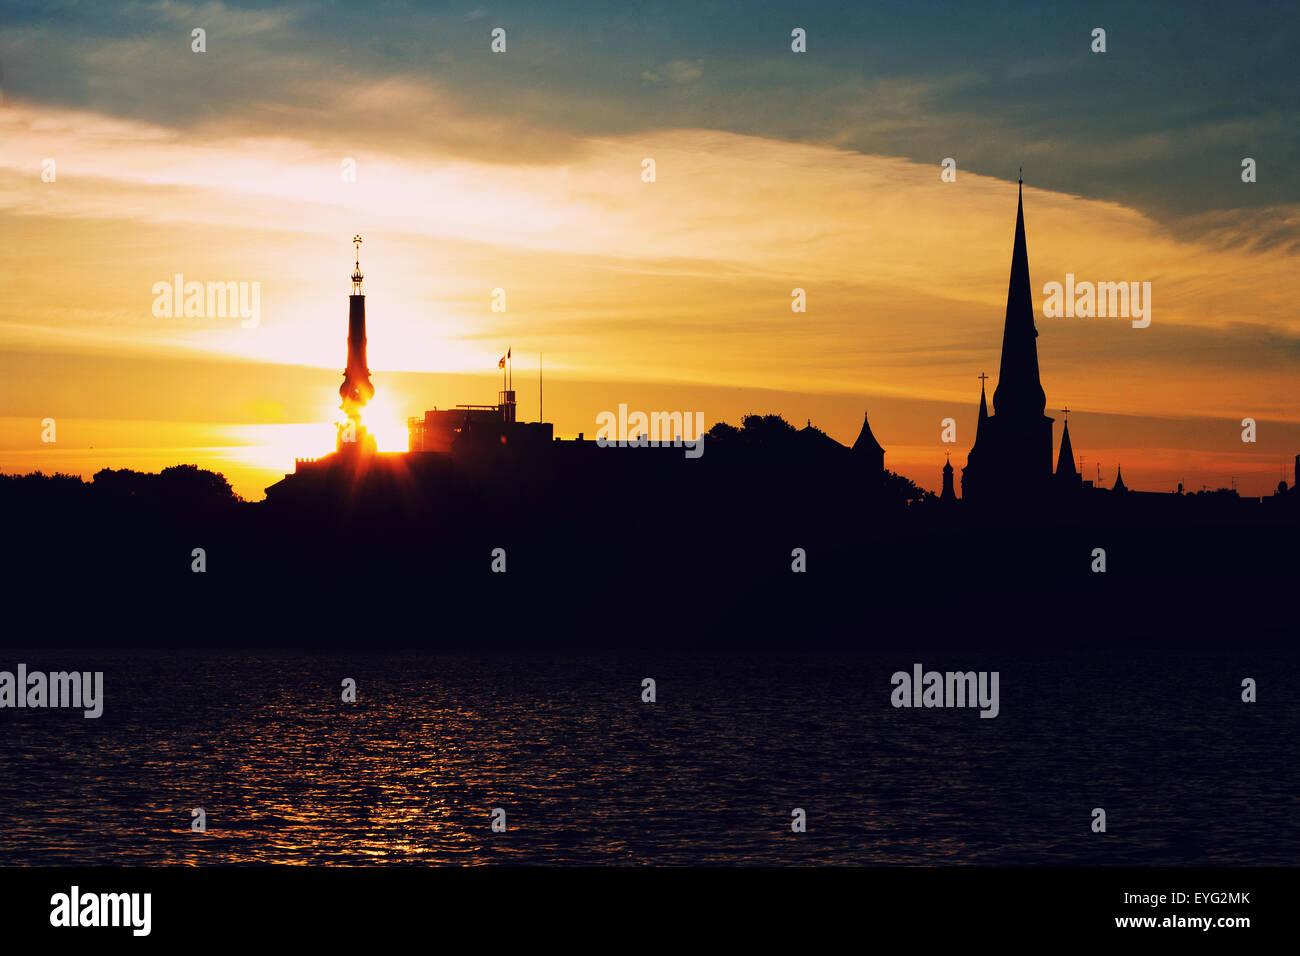 Latvia. Riga. Sunrise over the tower of the palace of President of Latvia on the Daugava River - Stock Image